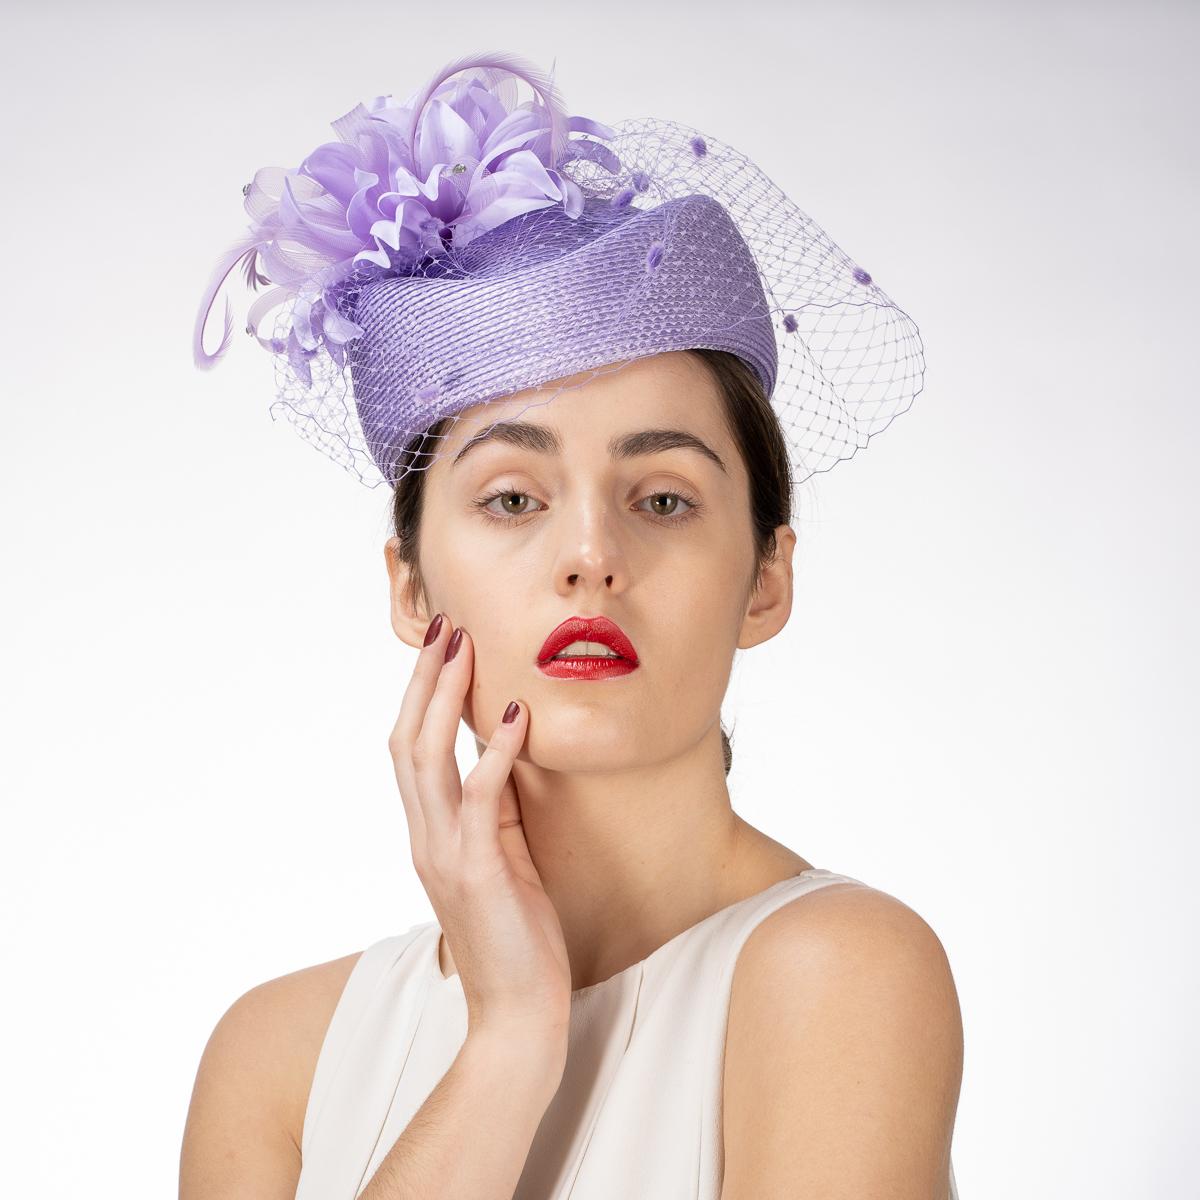 Lilac Flower Veil Pillbox Hats-301725-LL- Sun Yorkos  a1827571f71